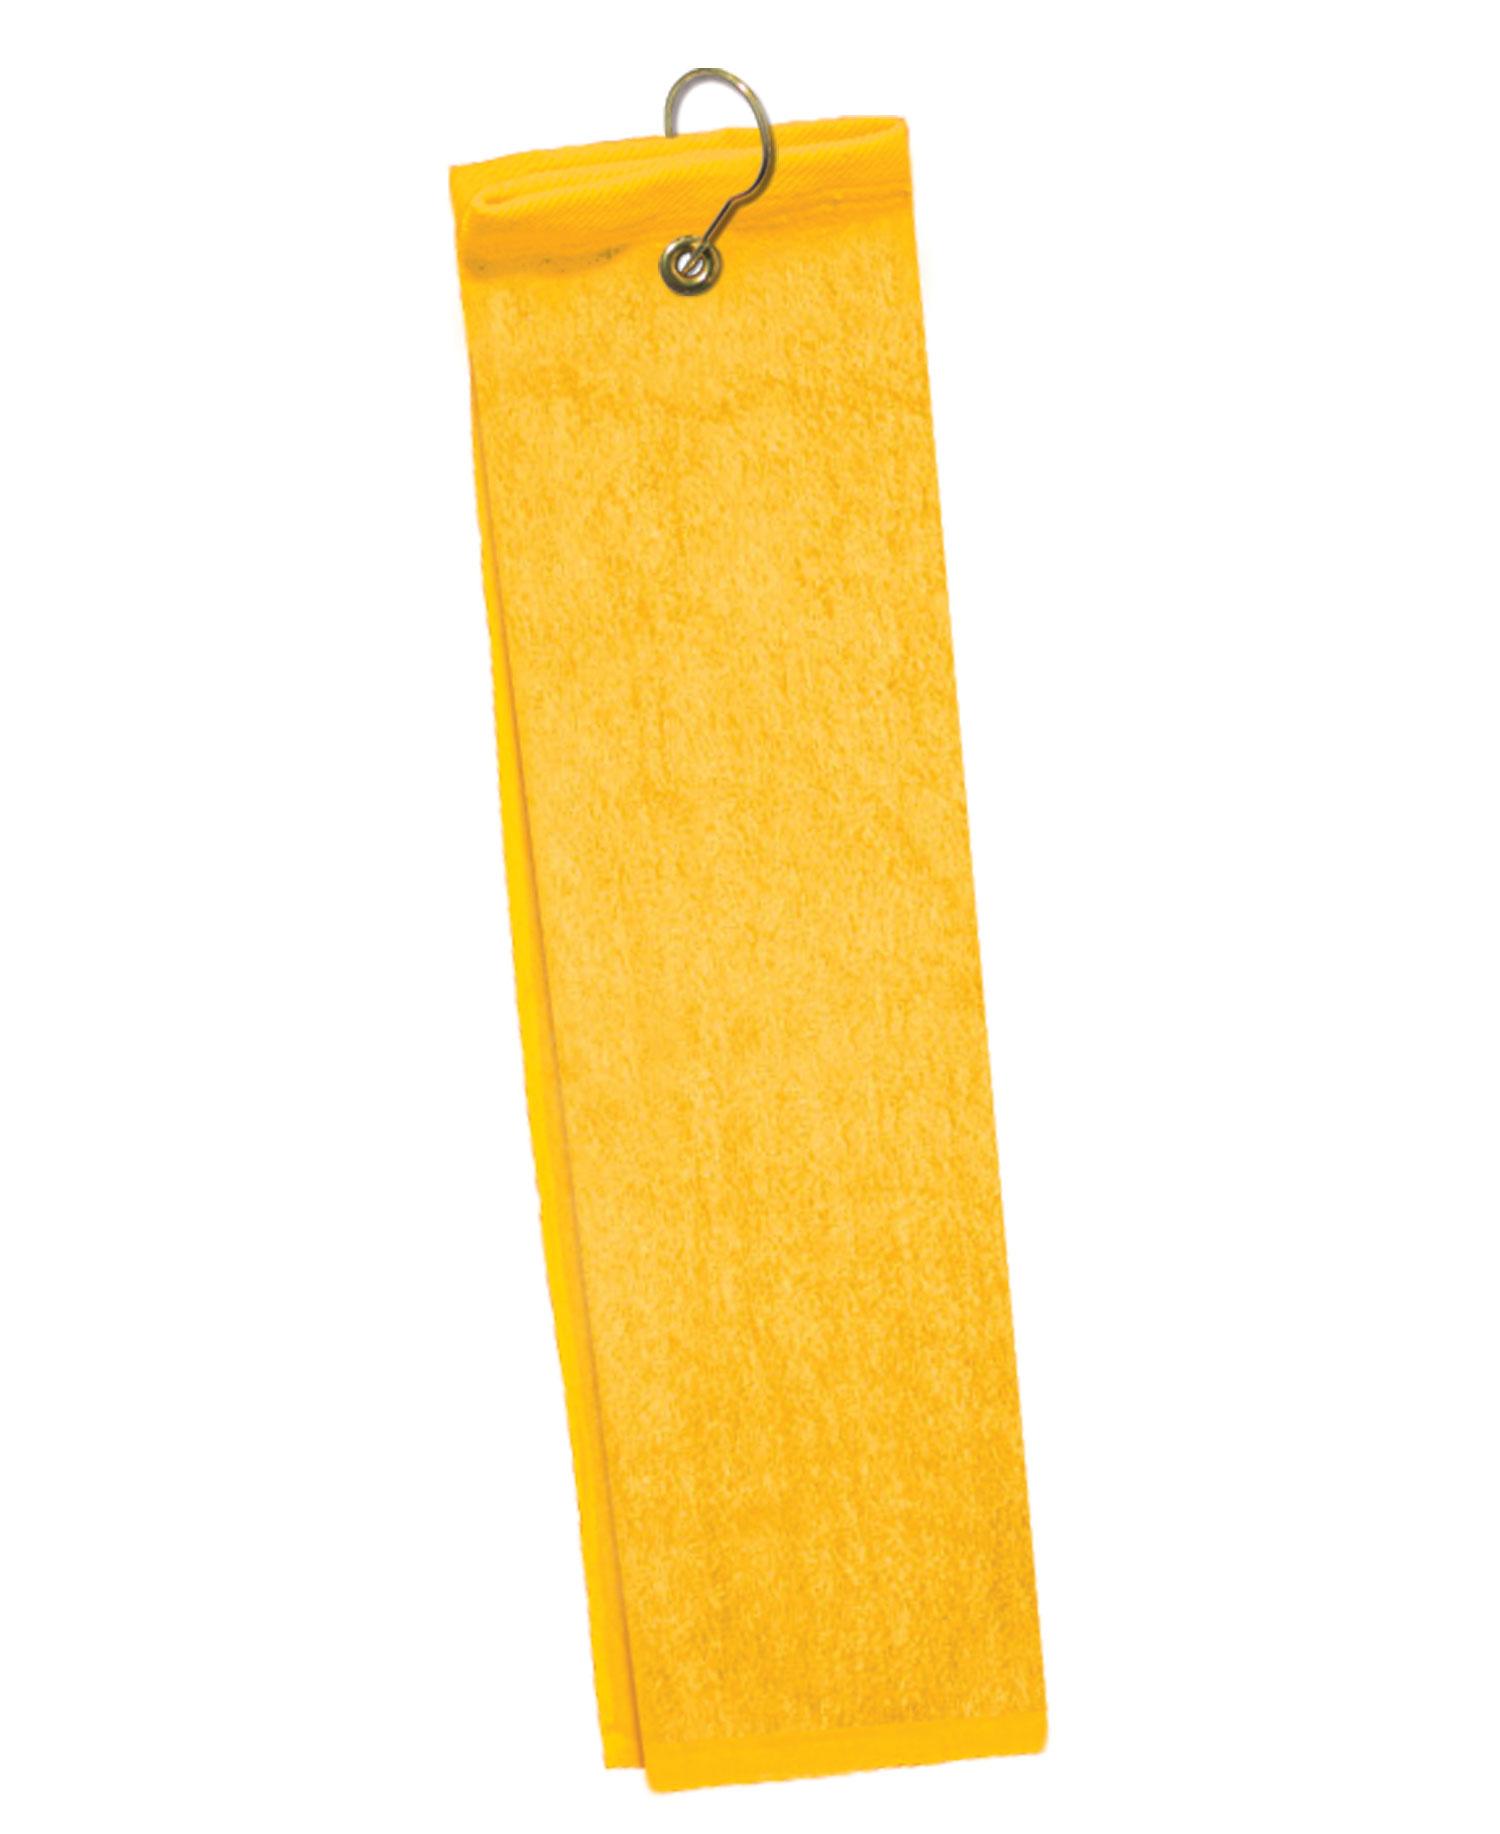 Q-Tees of California - Q0T200TG Hand Towel Trifold Grommet